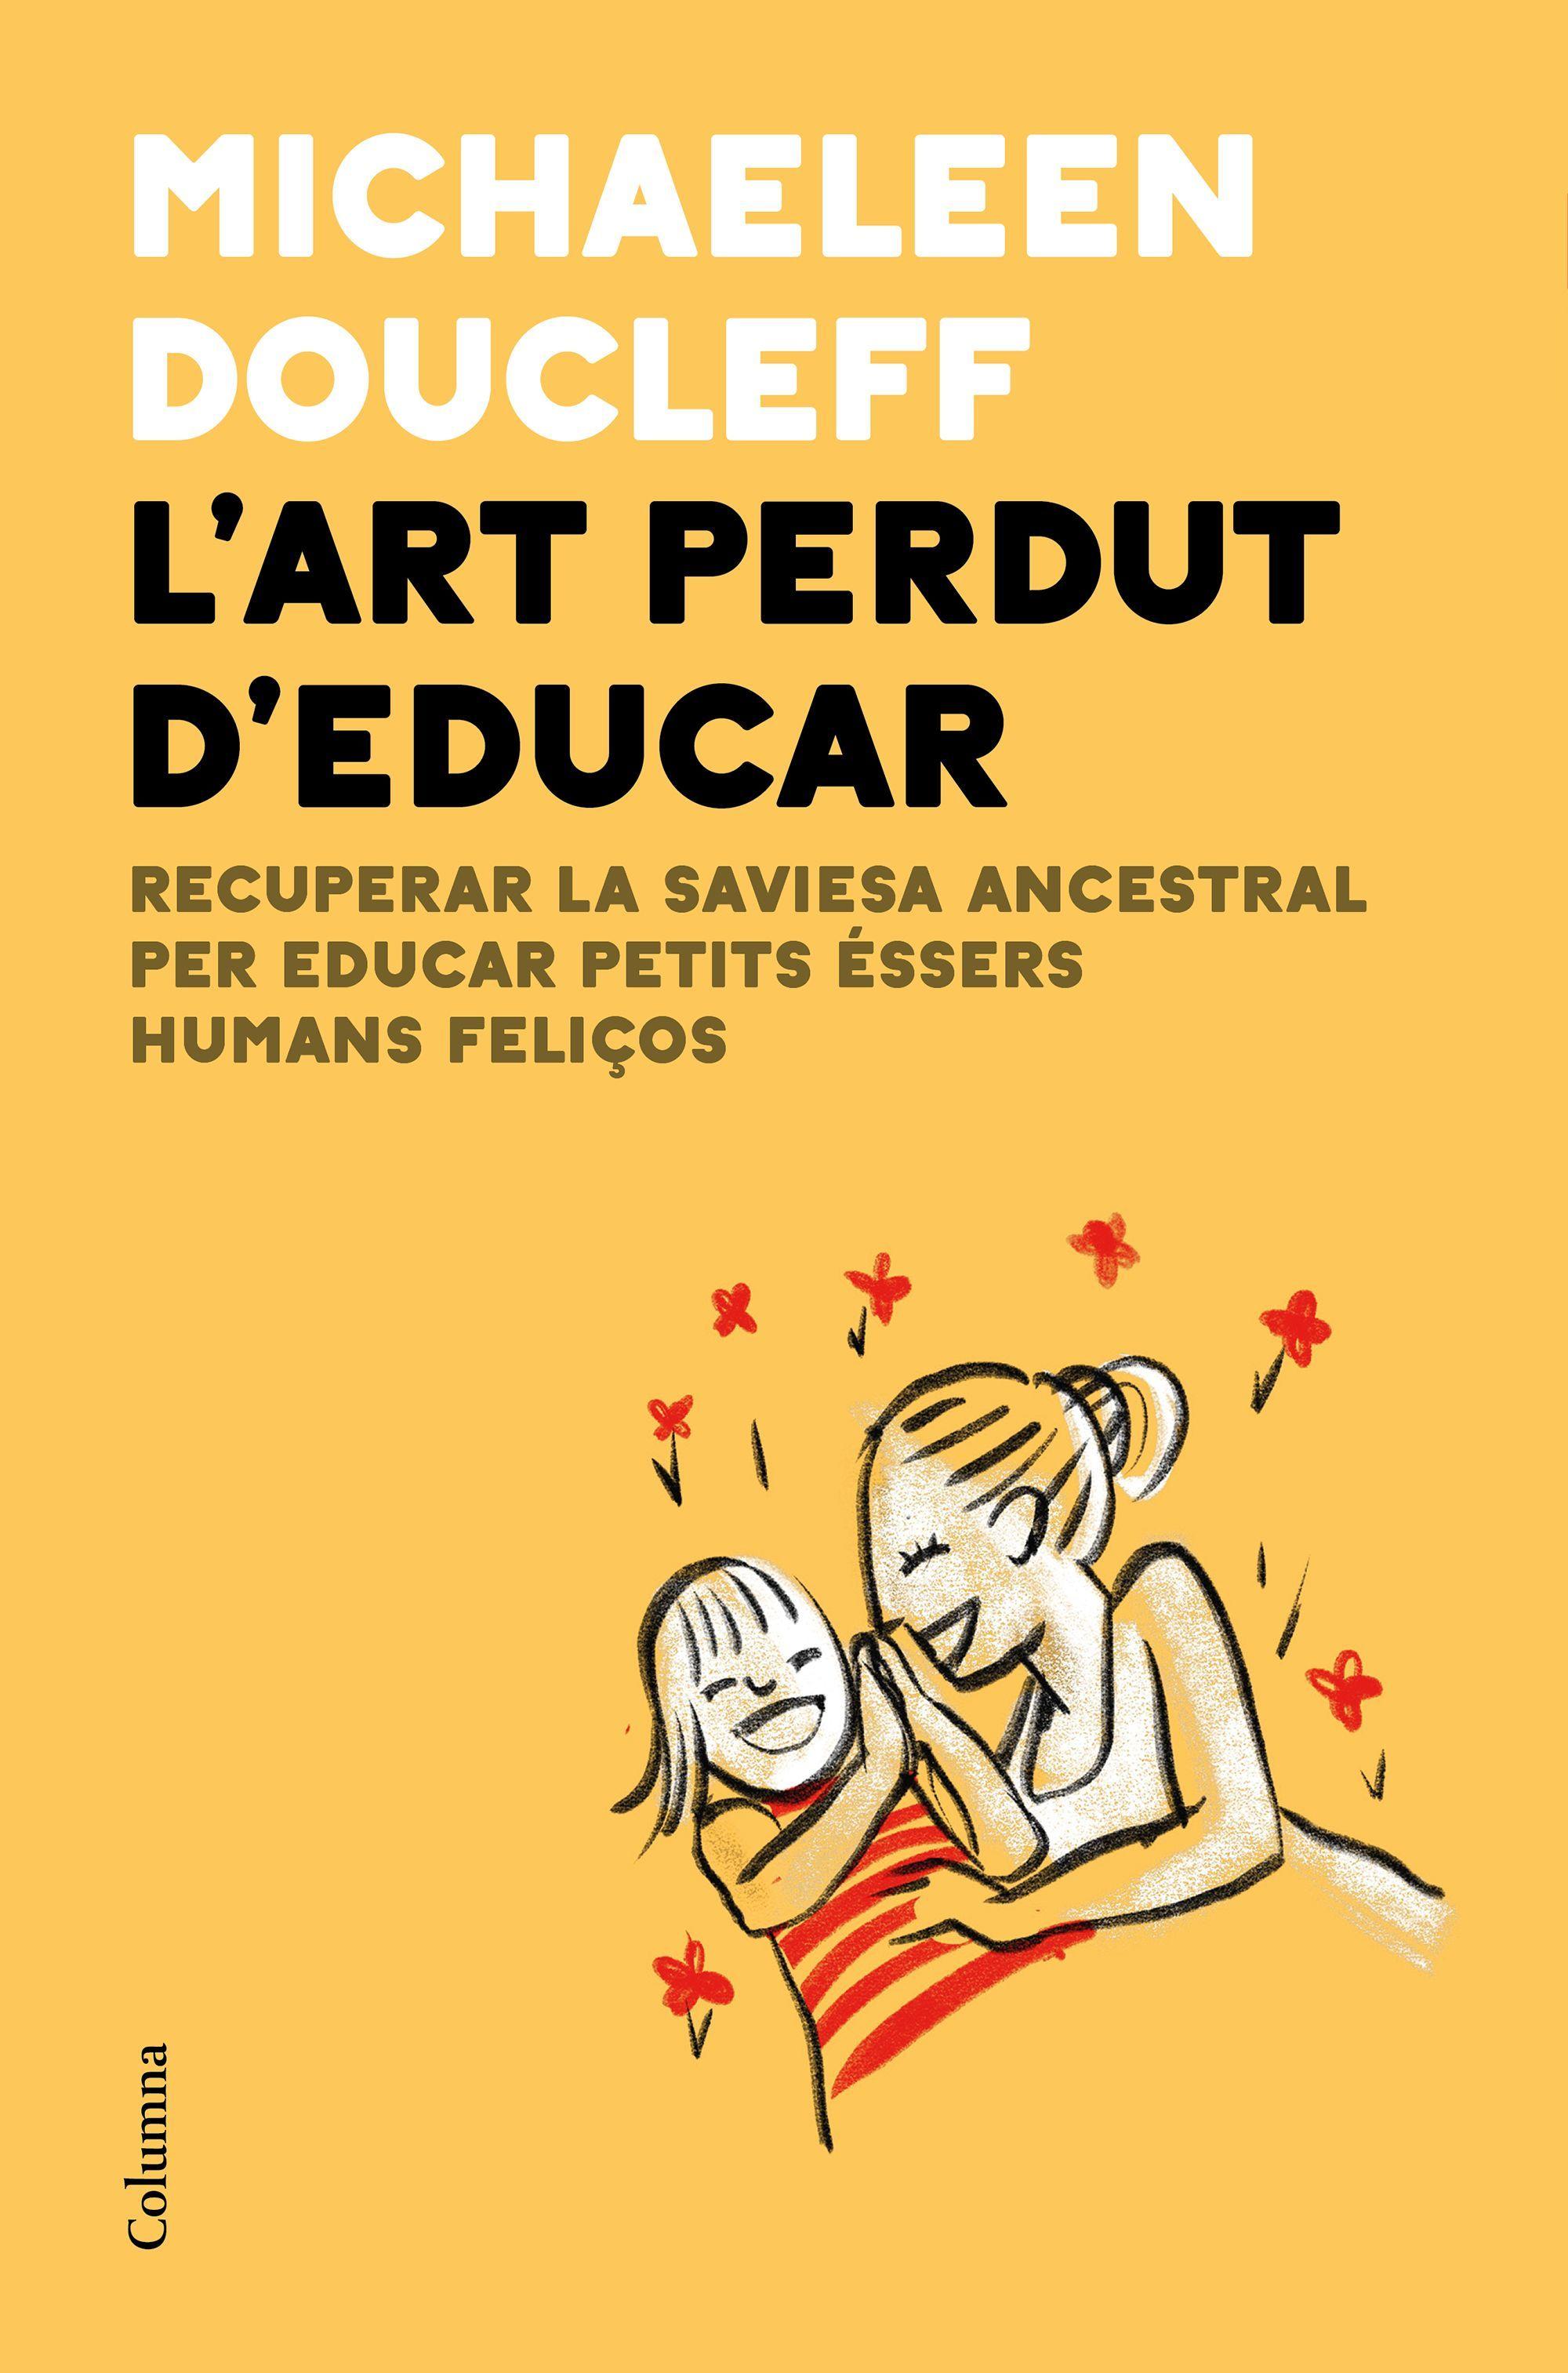 ART PERDUT D EDUCAR